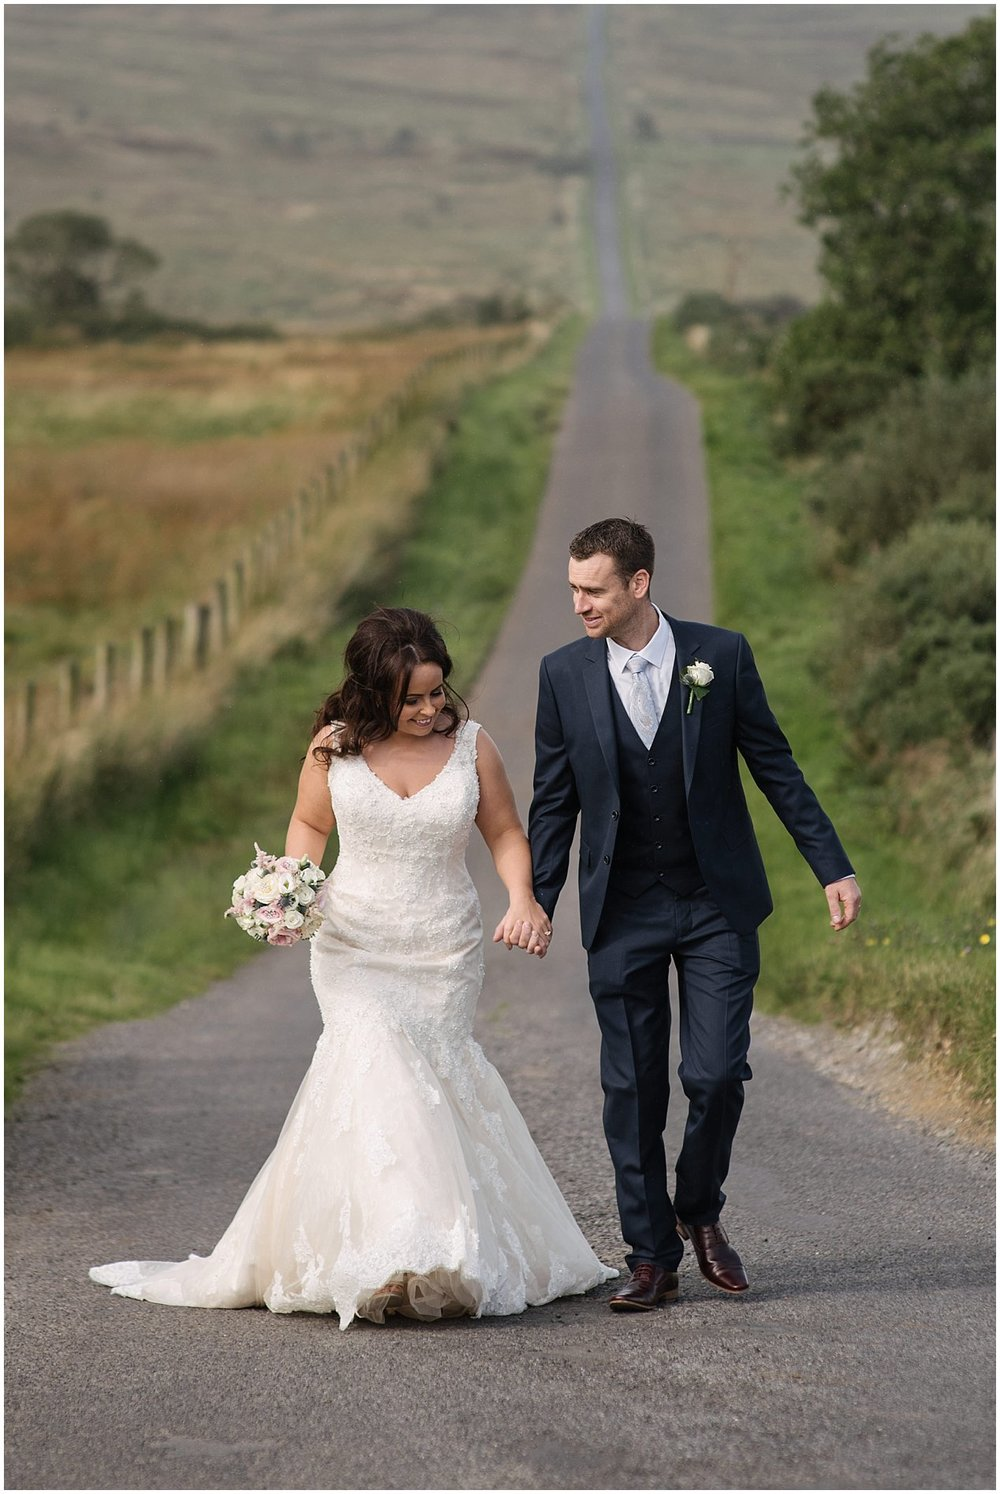 Shauneen_PJ_Hillgrove_Hotel_Monaghan_Wedding_jude_browne_photography_0058.jpg